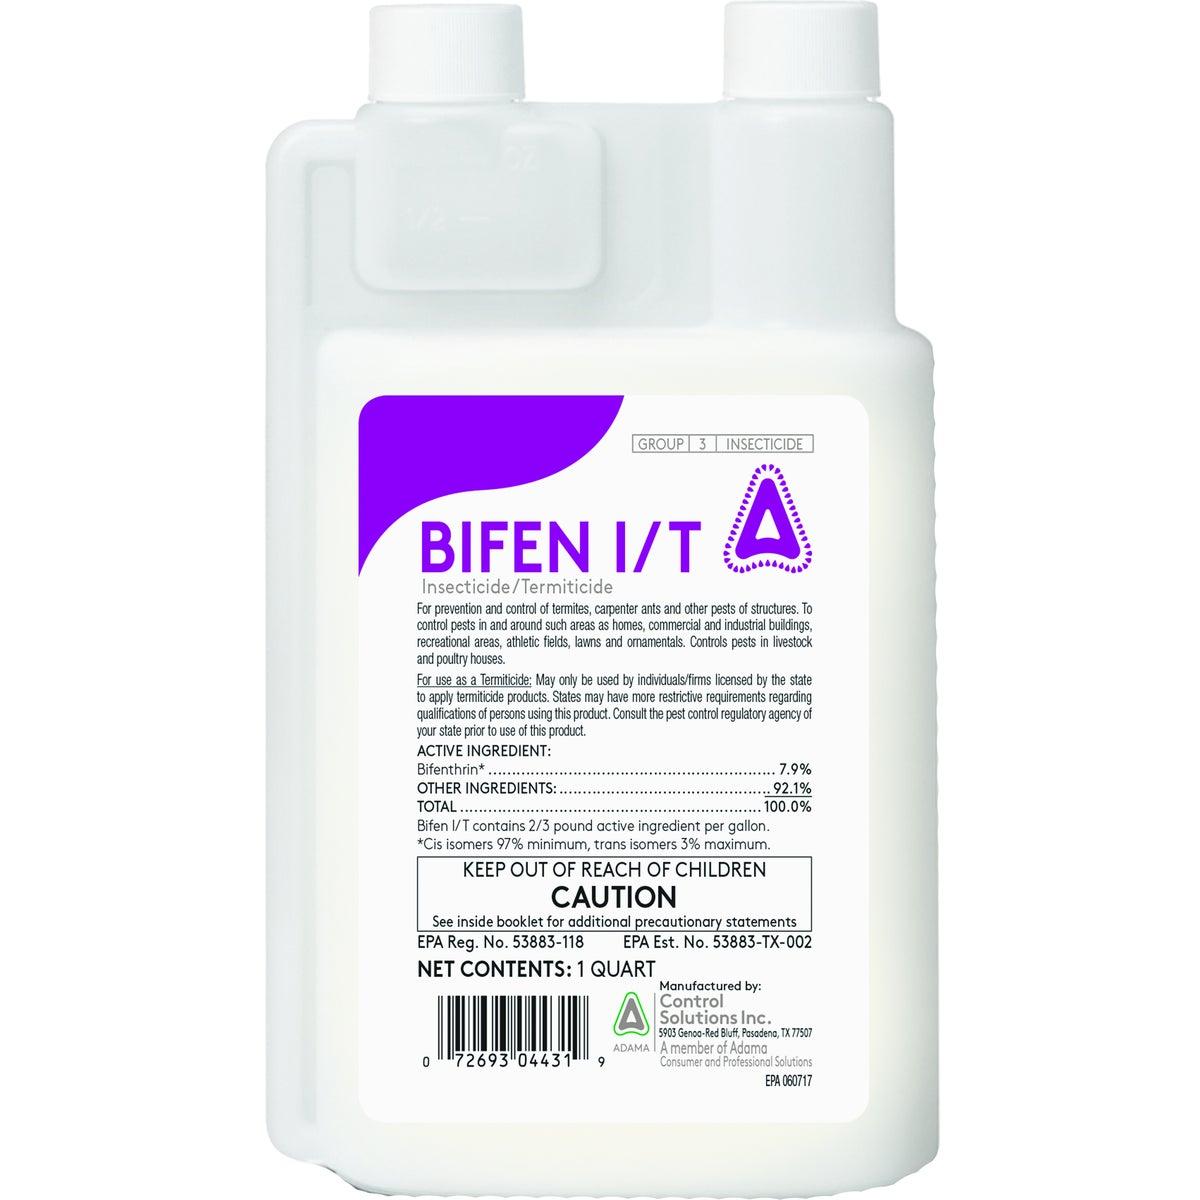 Bifen I/T Termite Insecticide